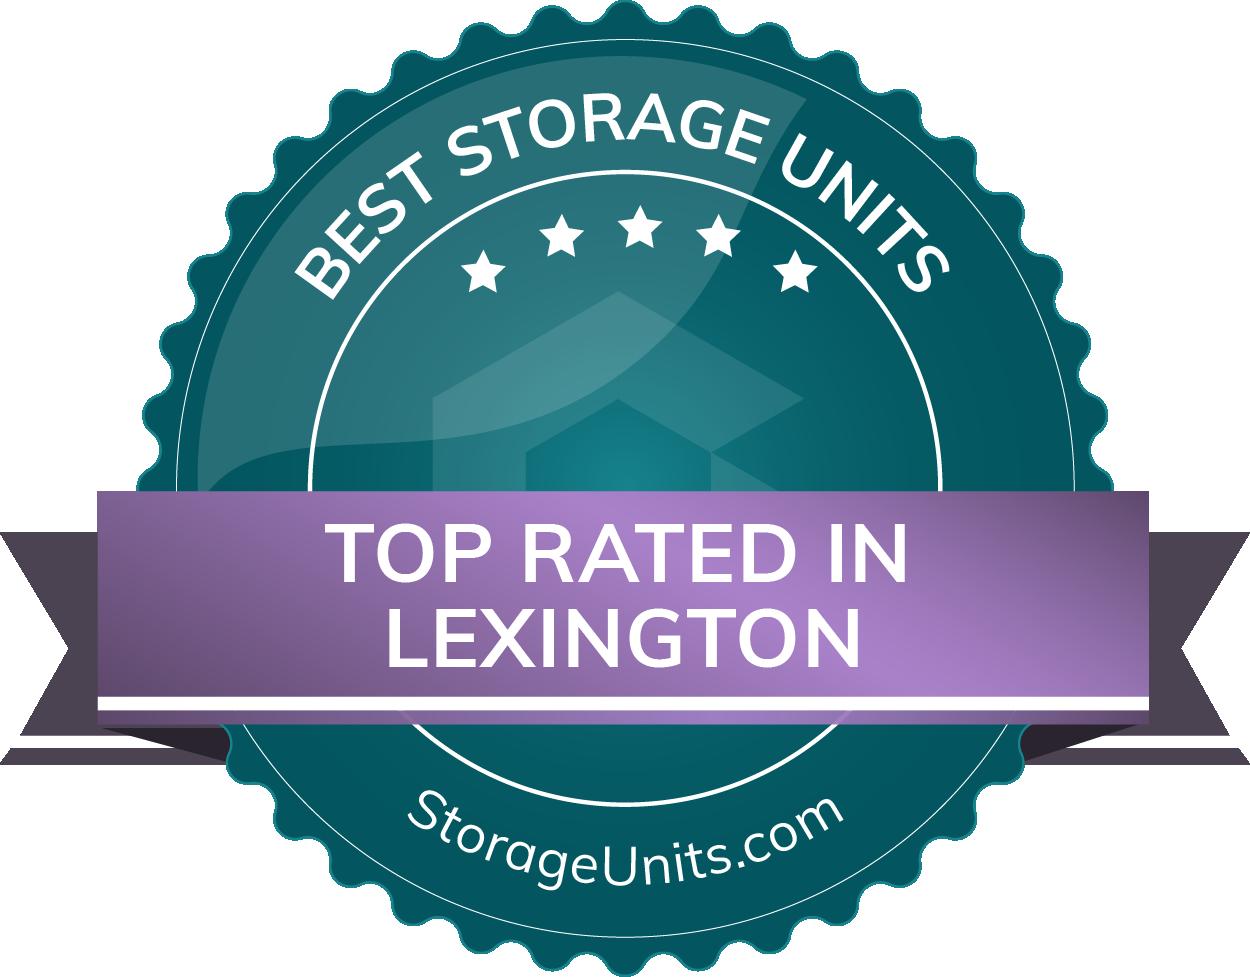 Best Self Storage Units in Lexington, KY